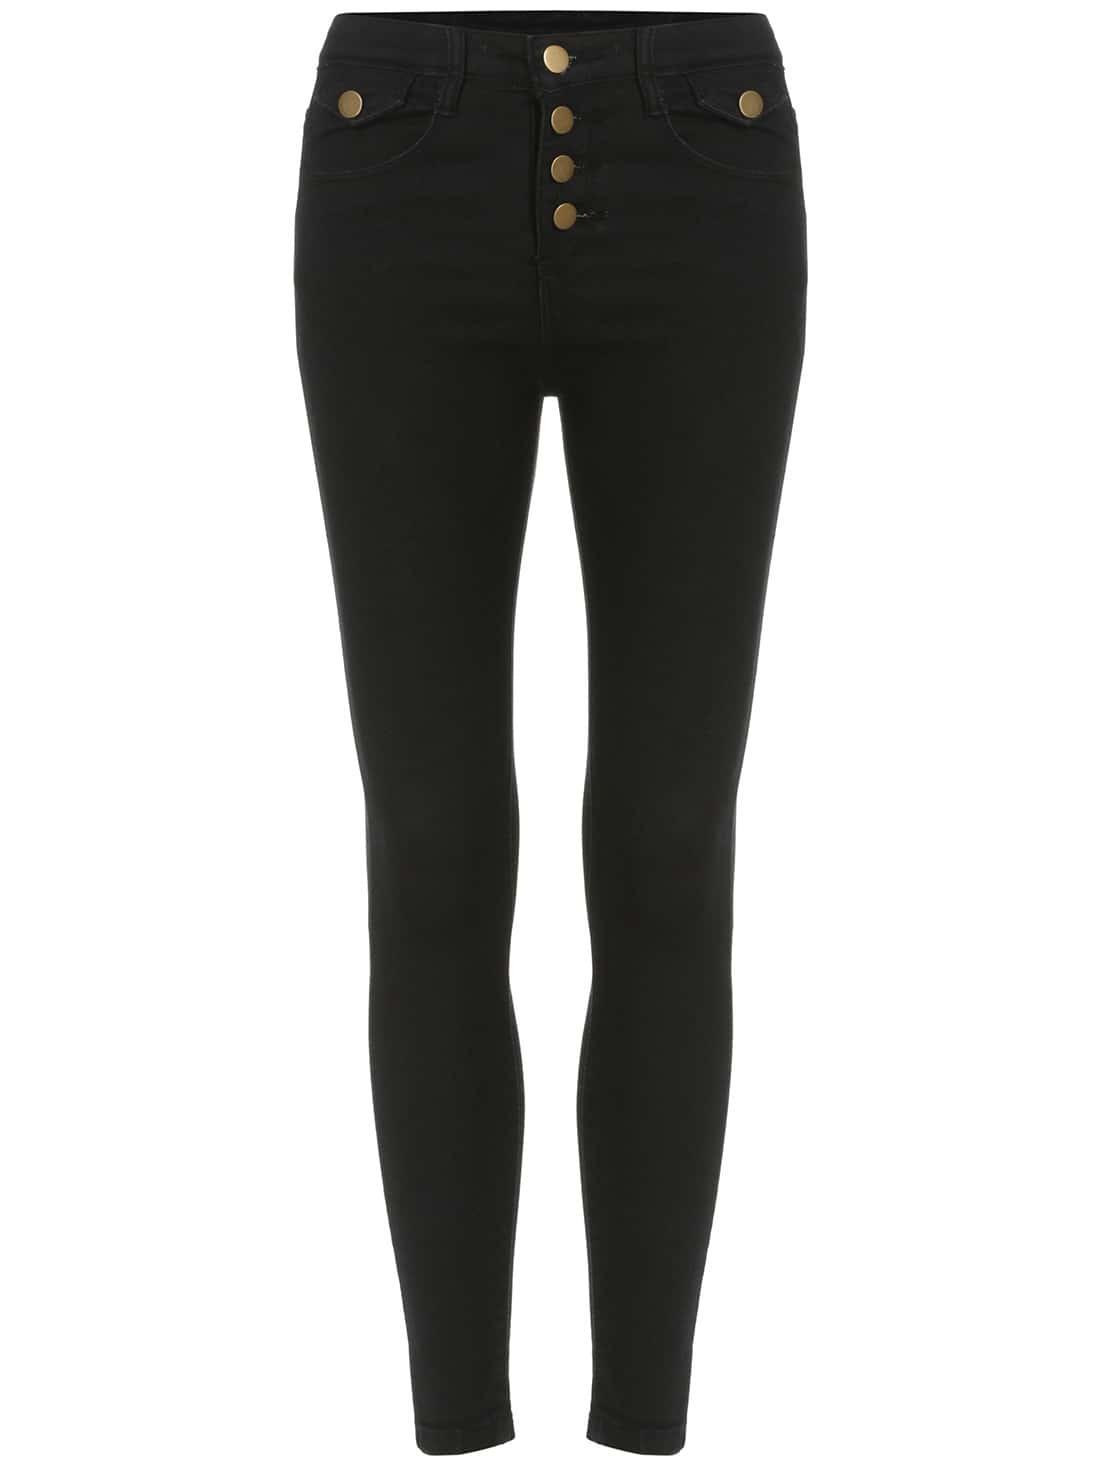 Black Slim Buttons Denim Pant